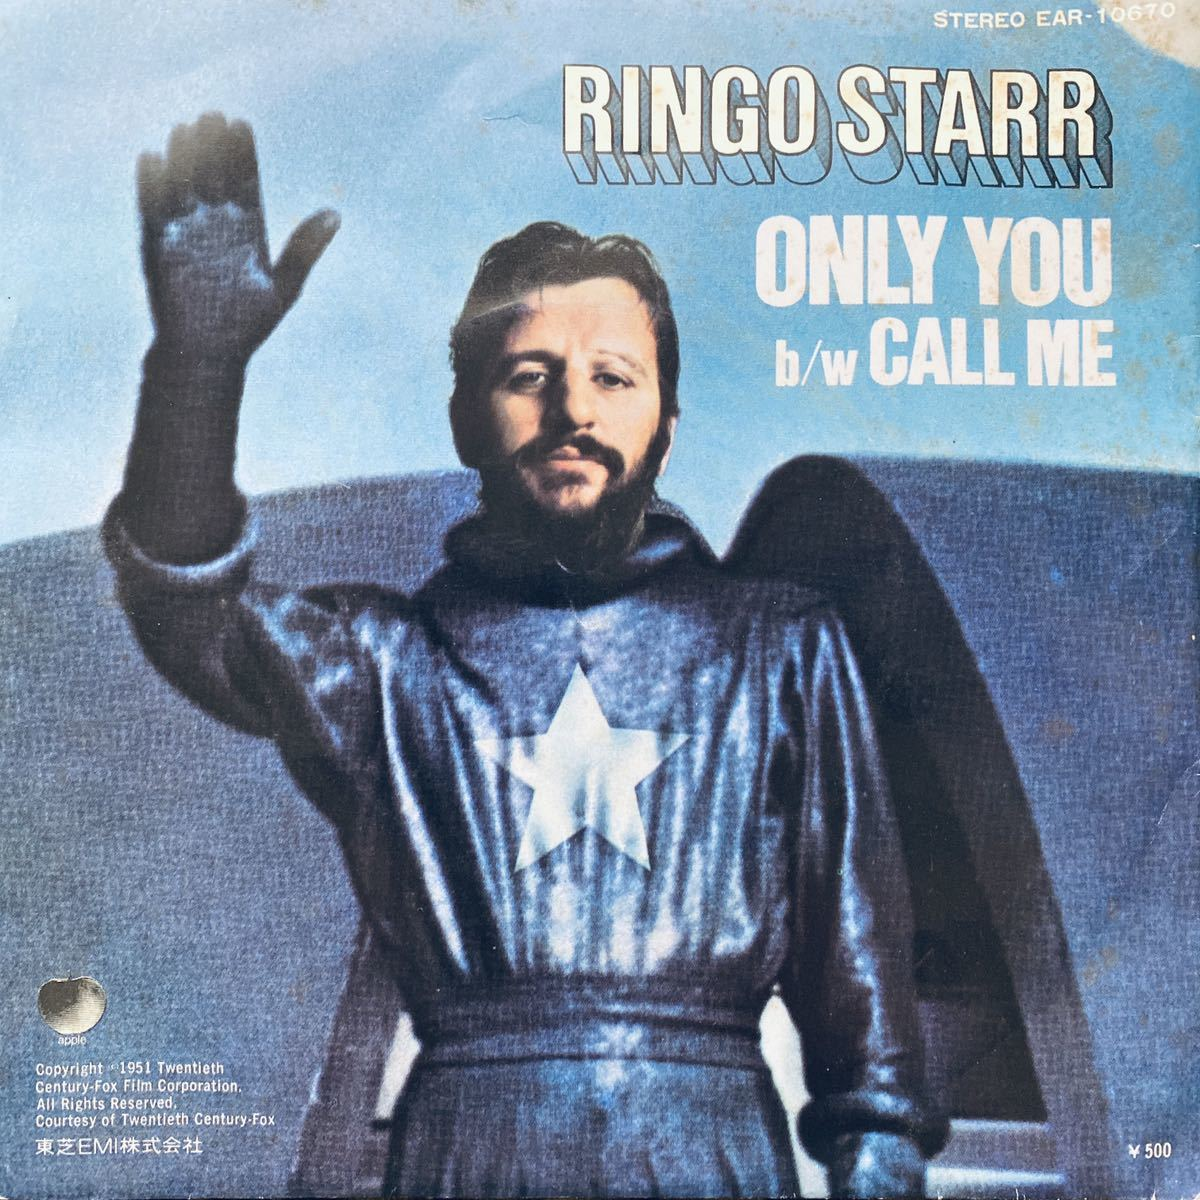 EP / リンゴ・スター - オンリー・ユー / 国内見本盤白ラベル プロモ 非売品 EAR-10670 RINGO STARR - ONLY YOU / Apple ビートルズ_画像1